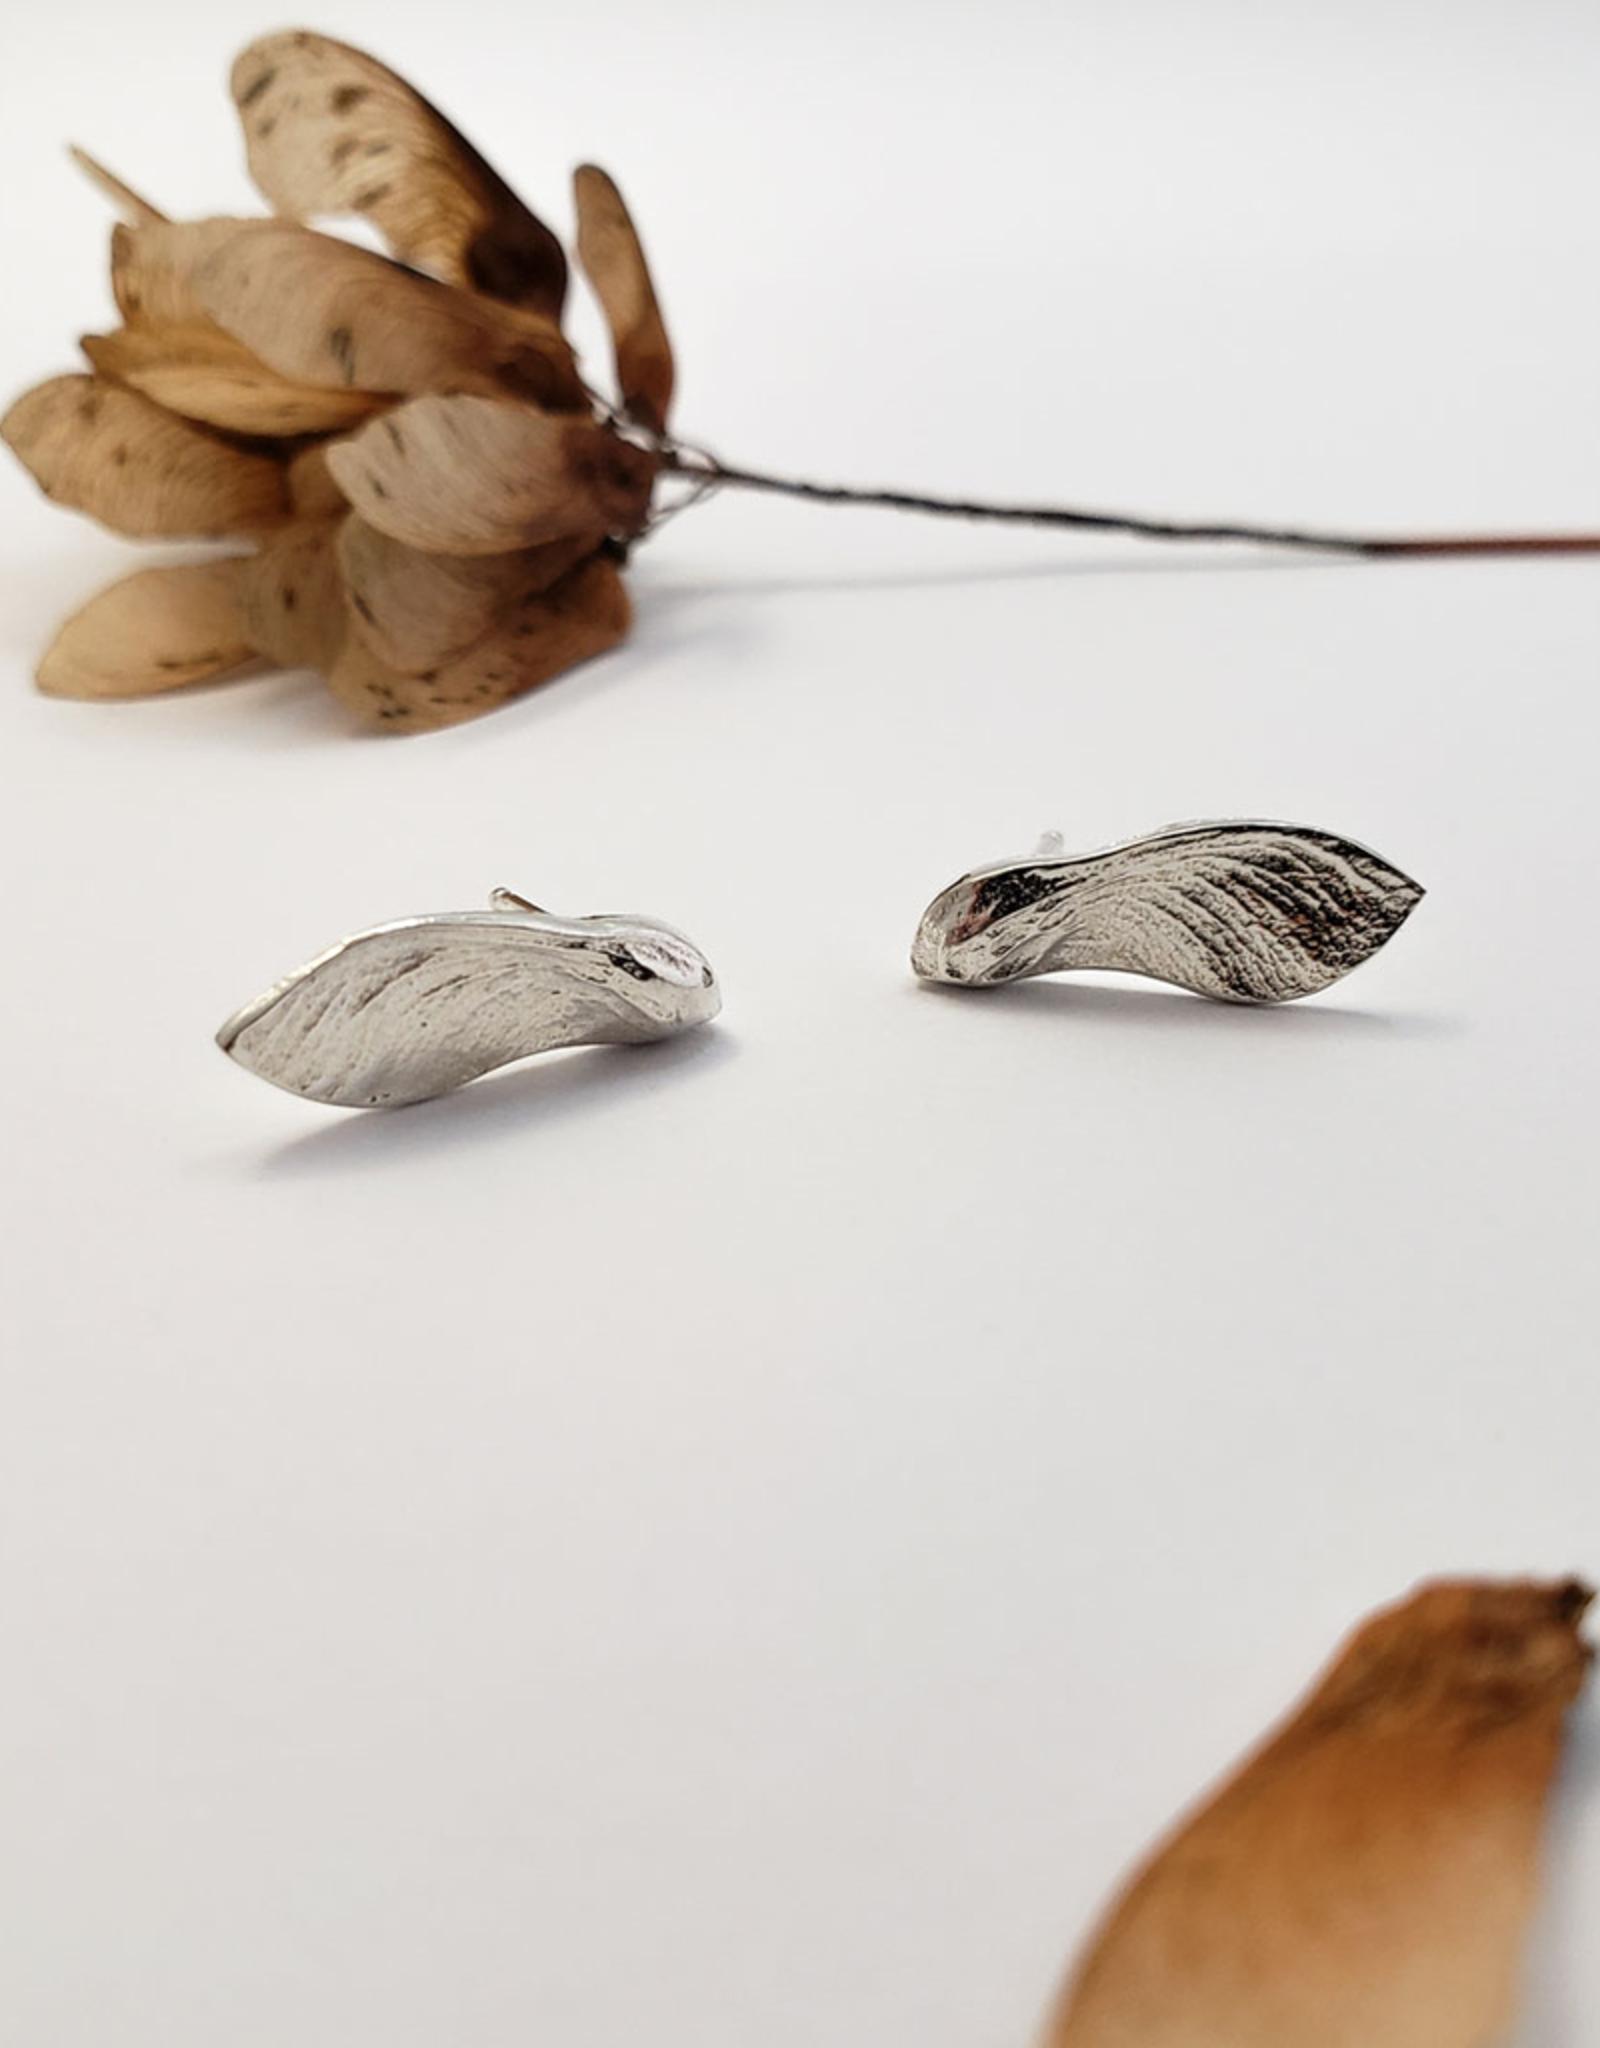 Handmade Maple Key Stud Earrings - Sterling Silver